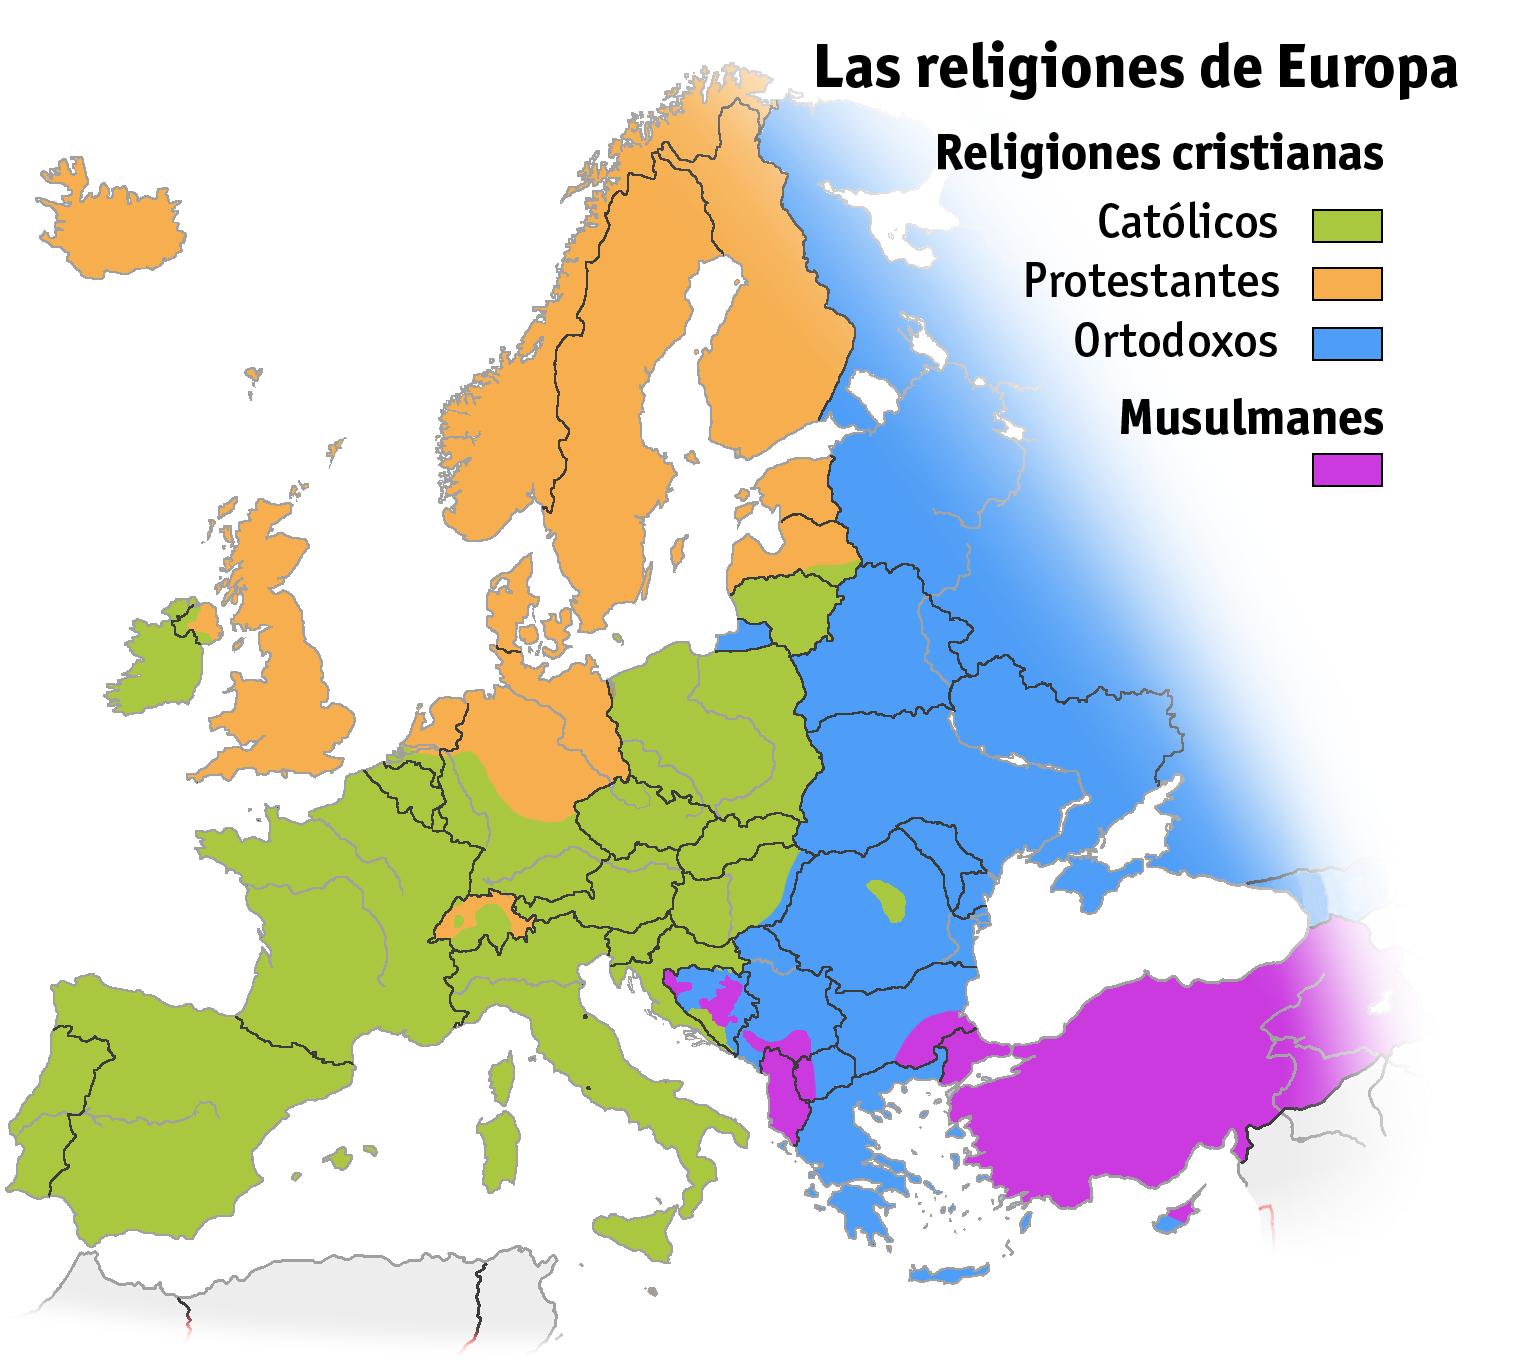 ReligionesdelContinenteEuropeo